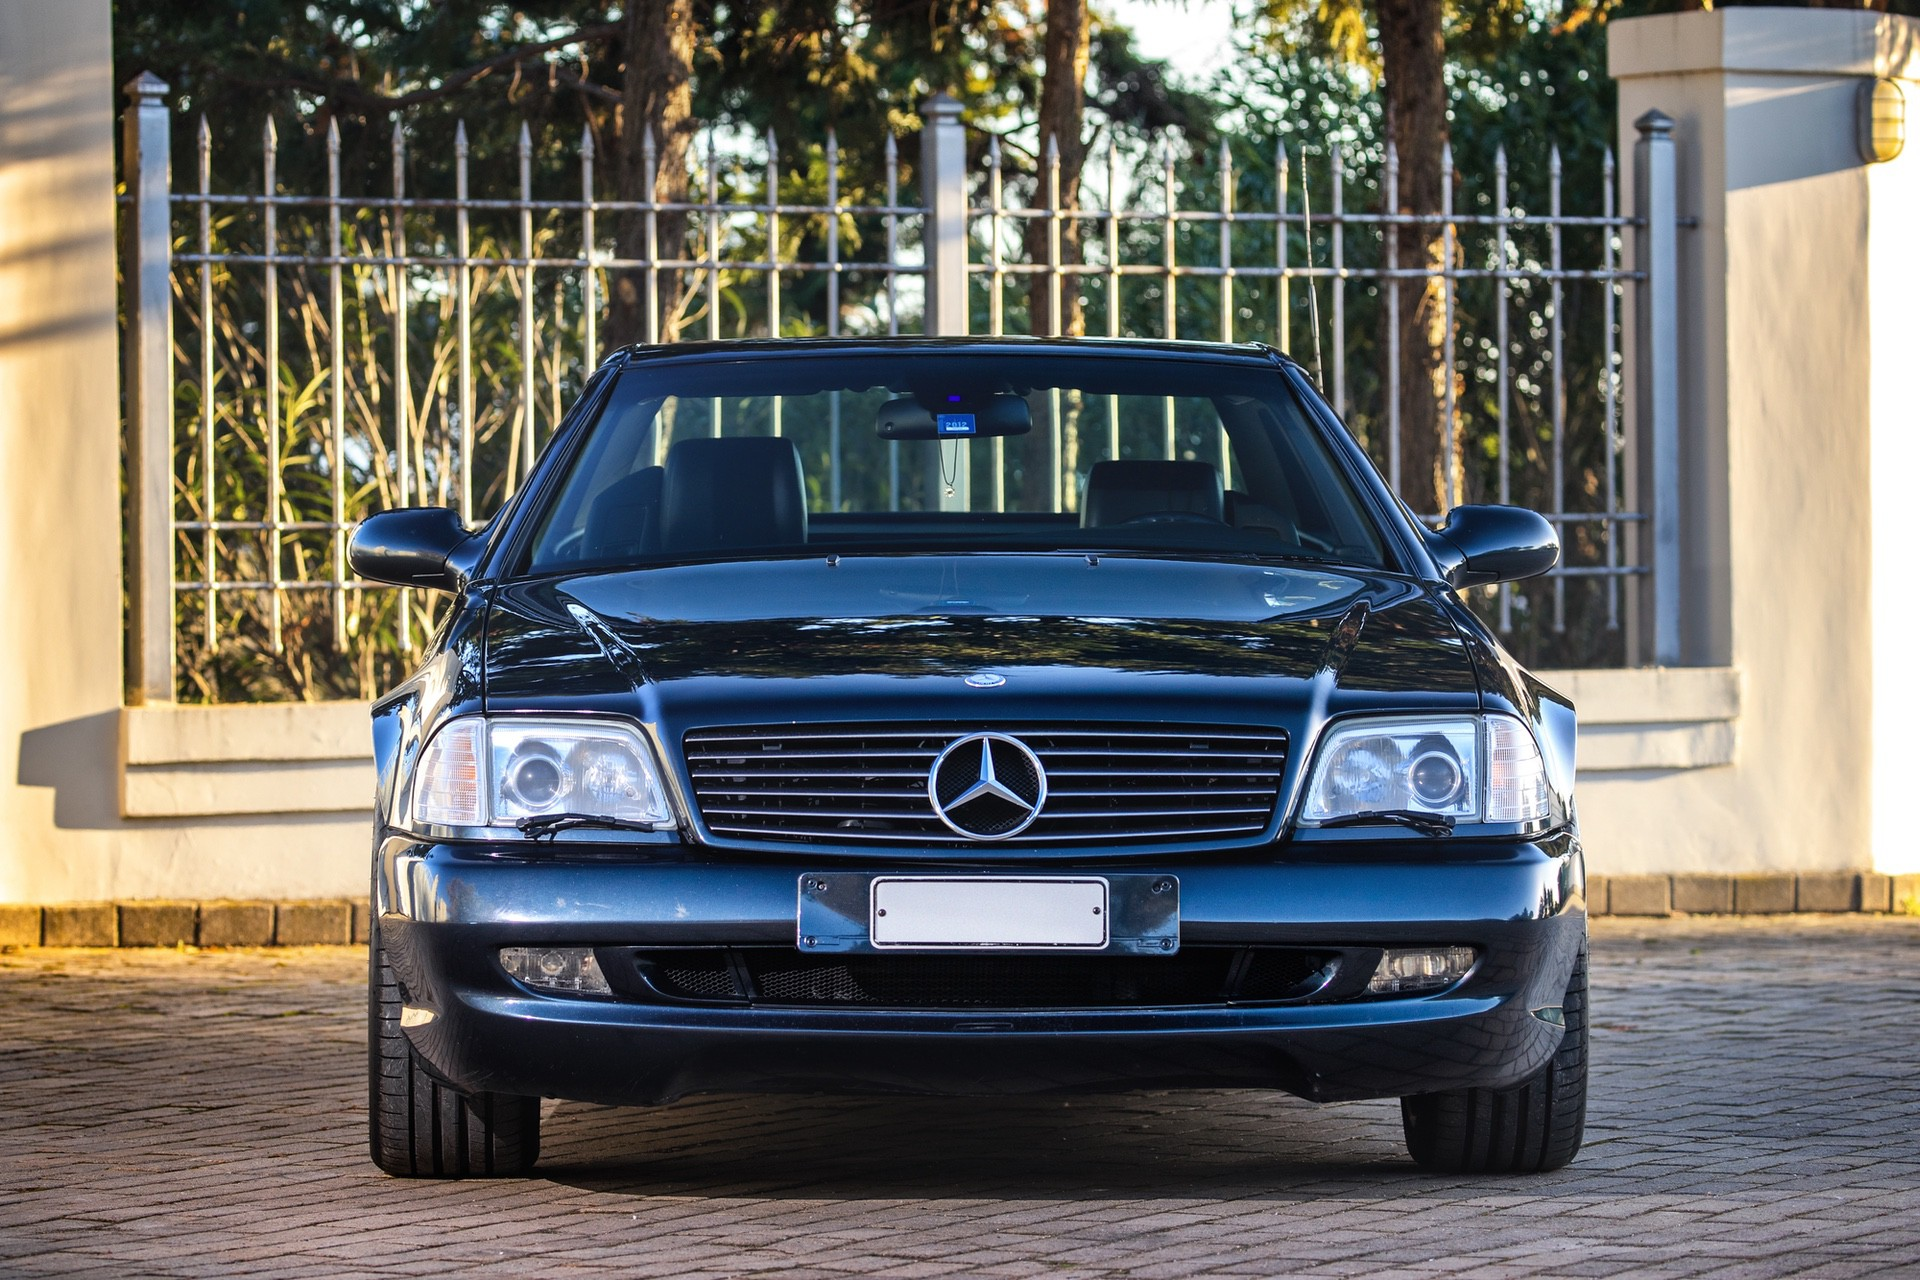 1999-Mercedes-Benz-SL-73-AMG-_7